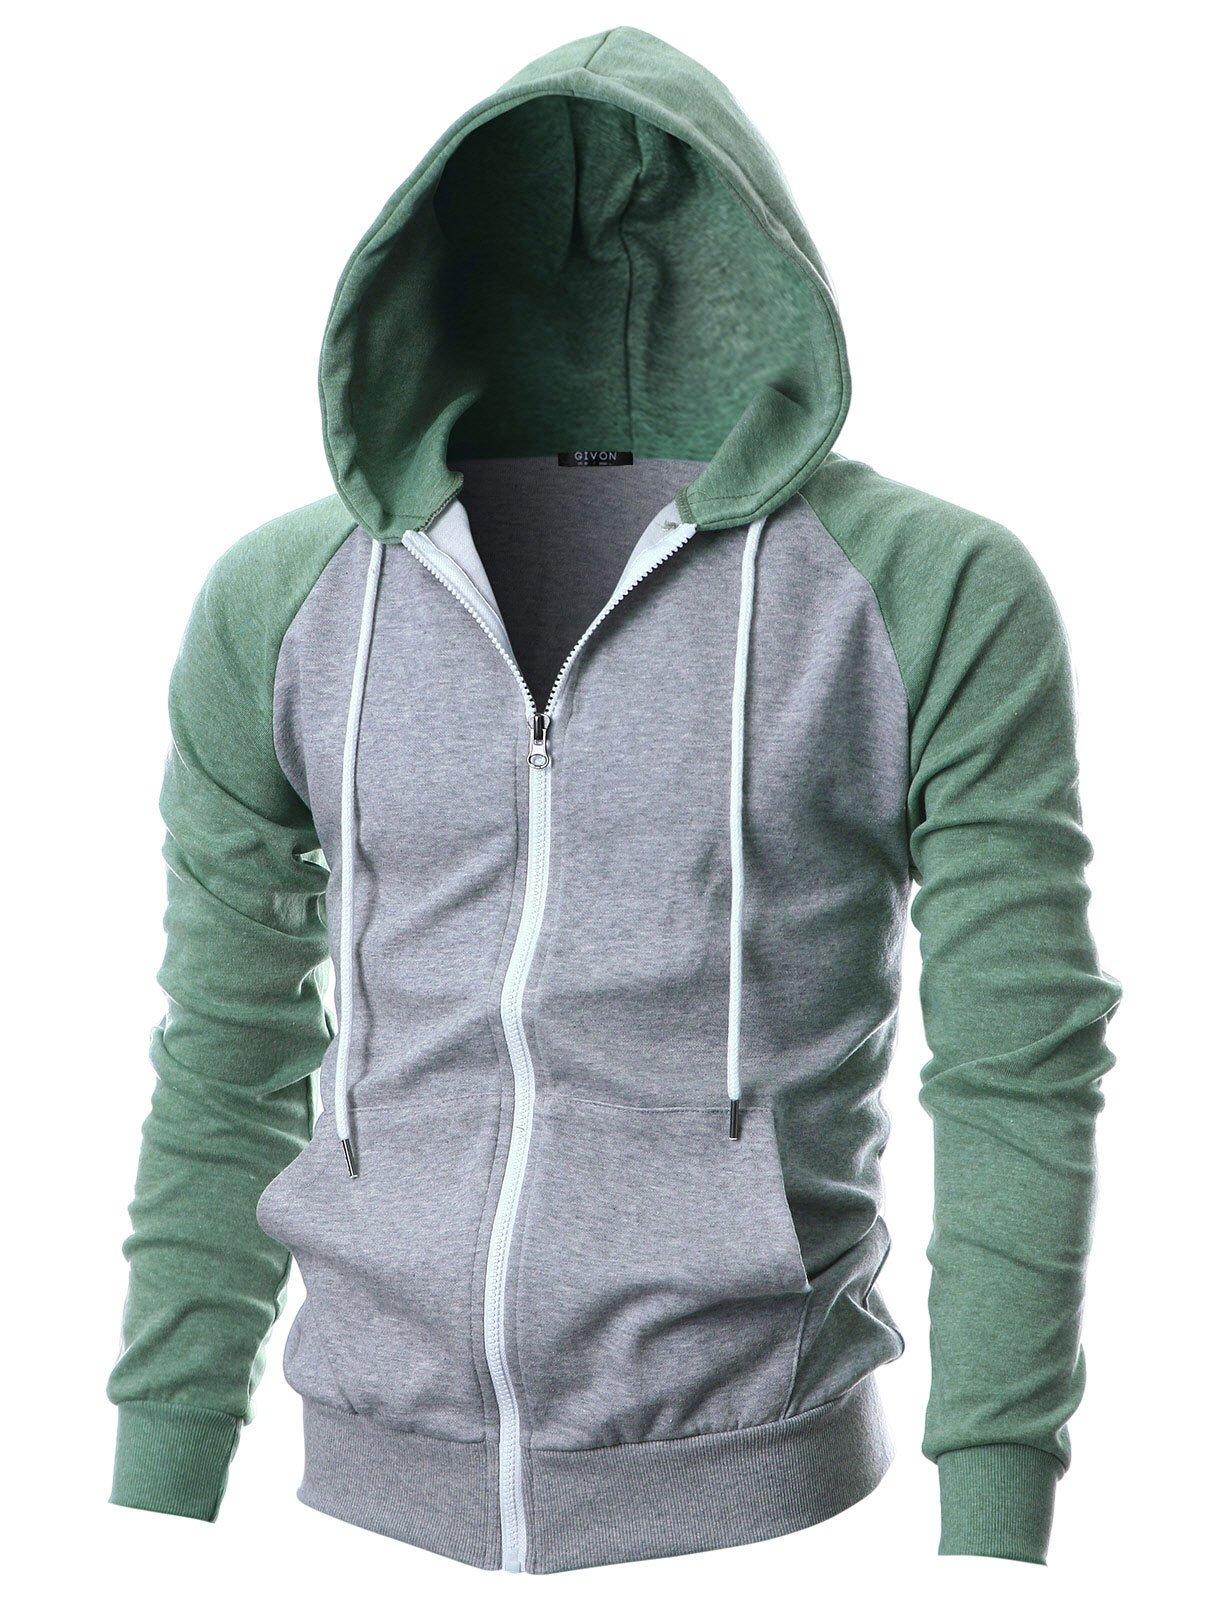 GIVON Mens Slim Fit Long Sleeve Lightweight Raglan Zip-up Hoodie with Kanga Pocket/DCF017-GREYJADEGREEN-M